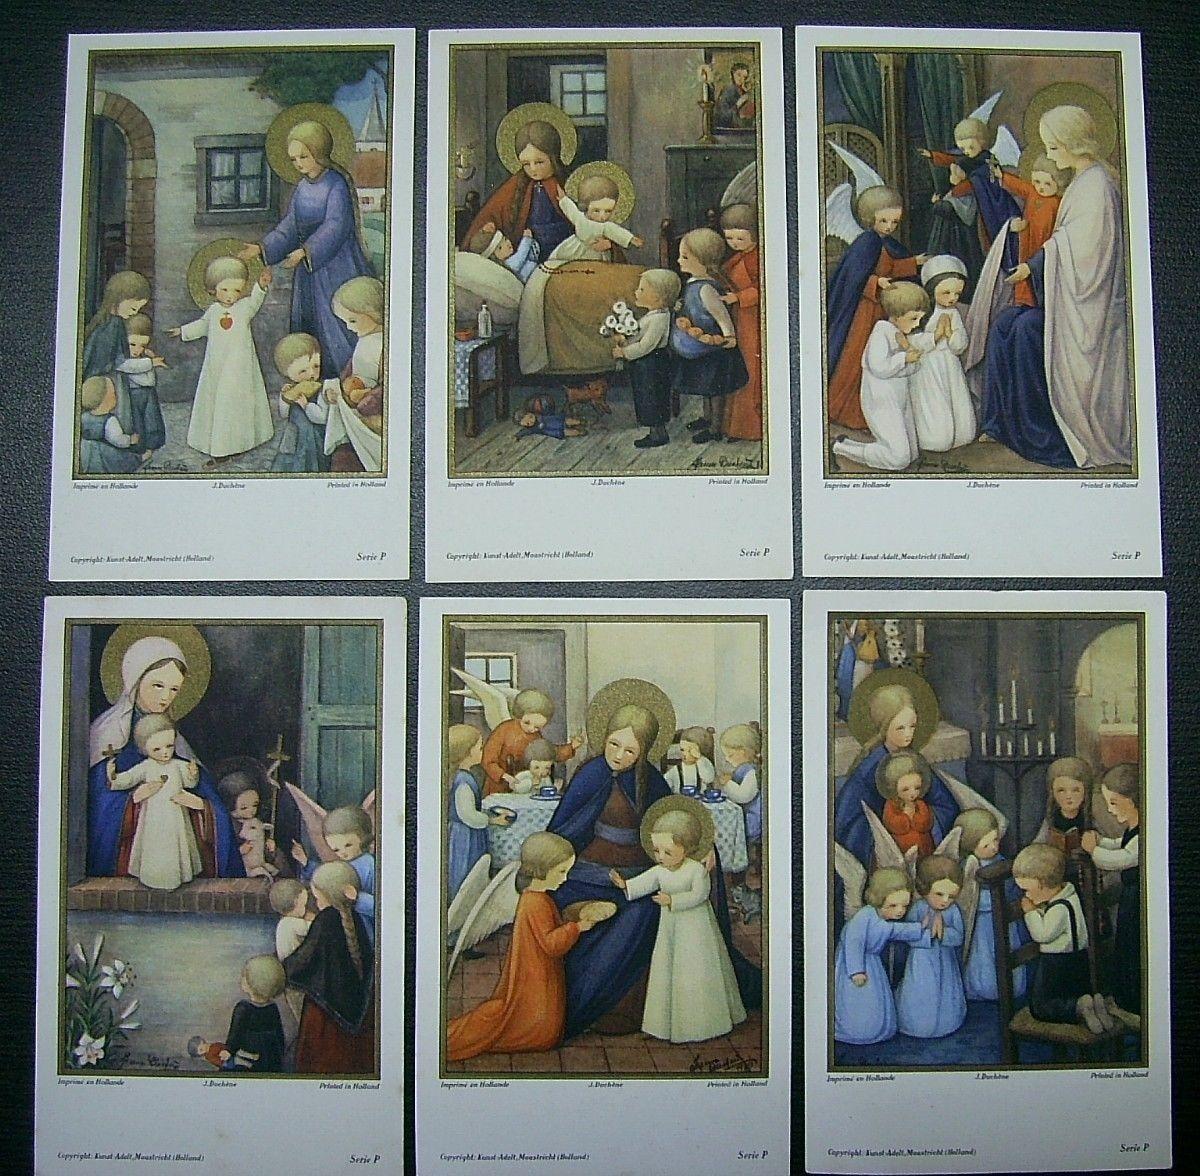 Pin on Catholic Art and Holy Cards